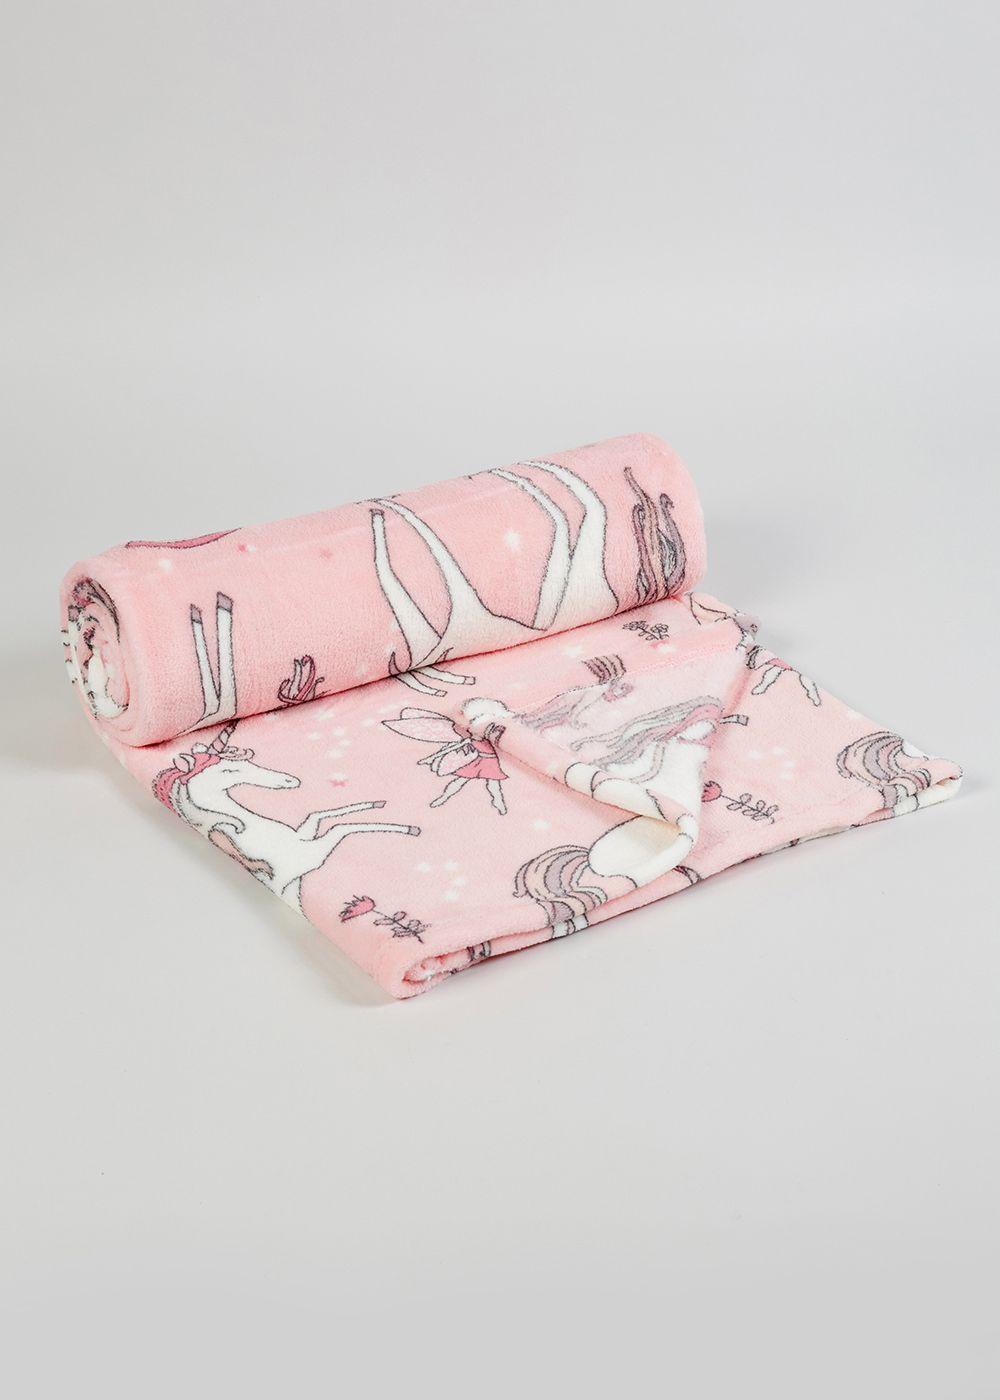 Unicorn Print Fleece Throw 150cm X 130cm Pink Fleece